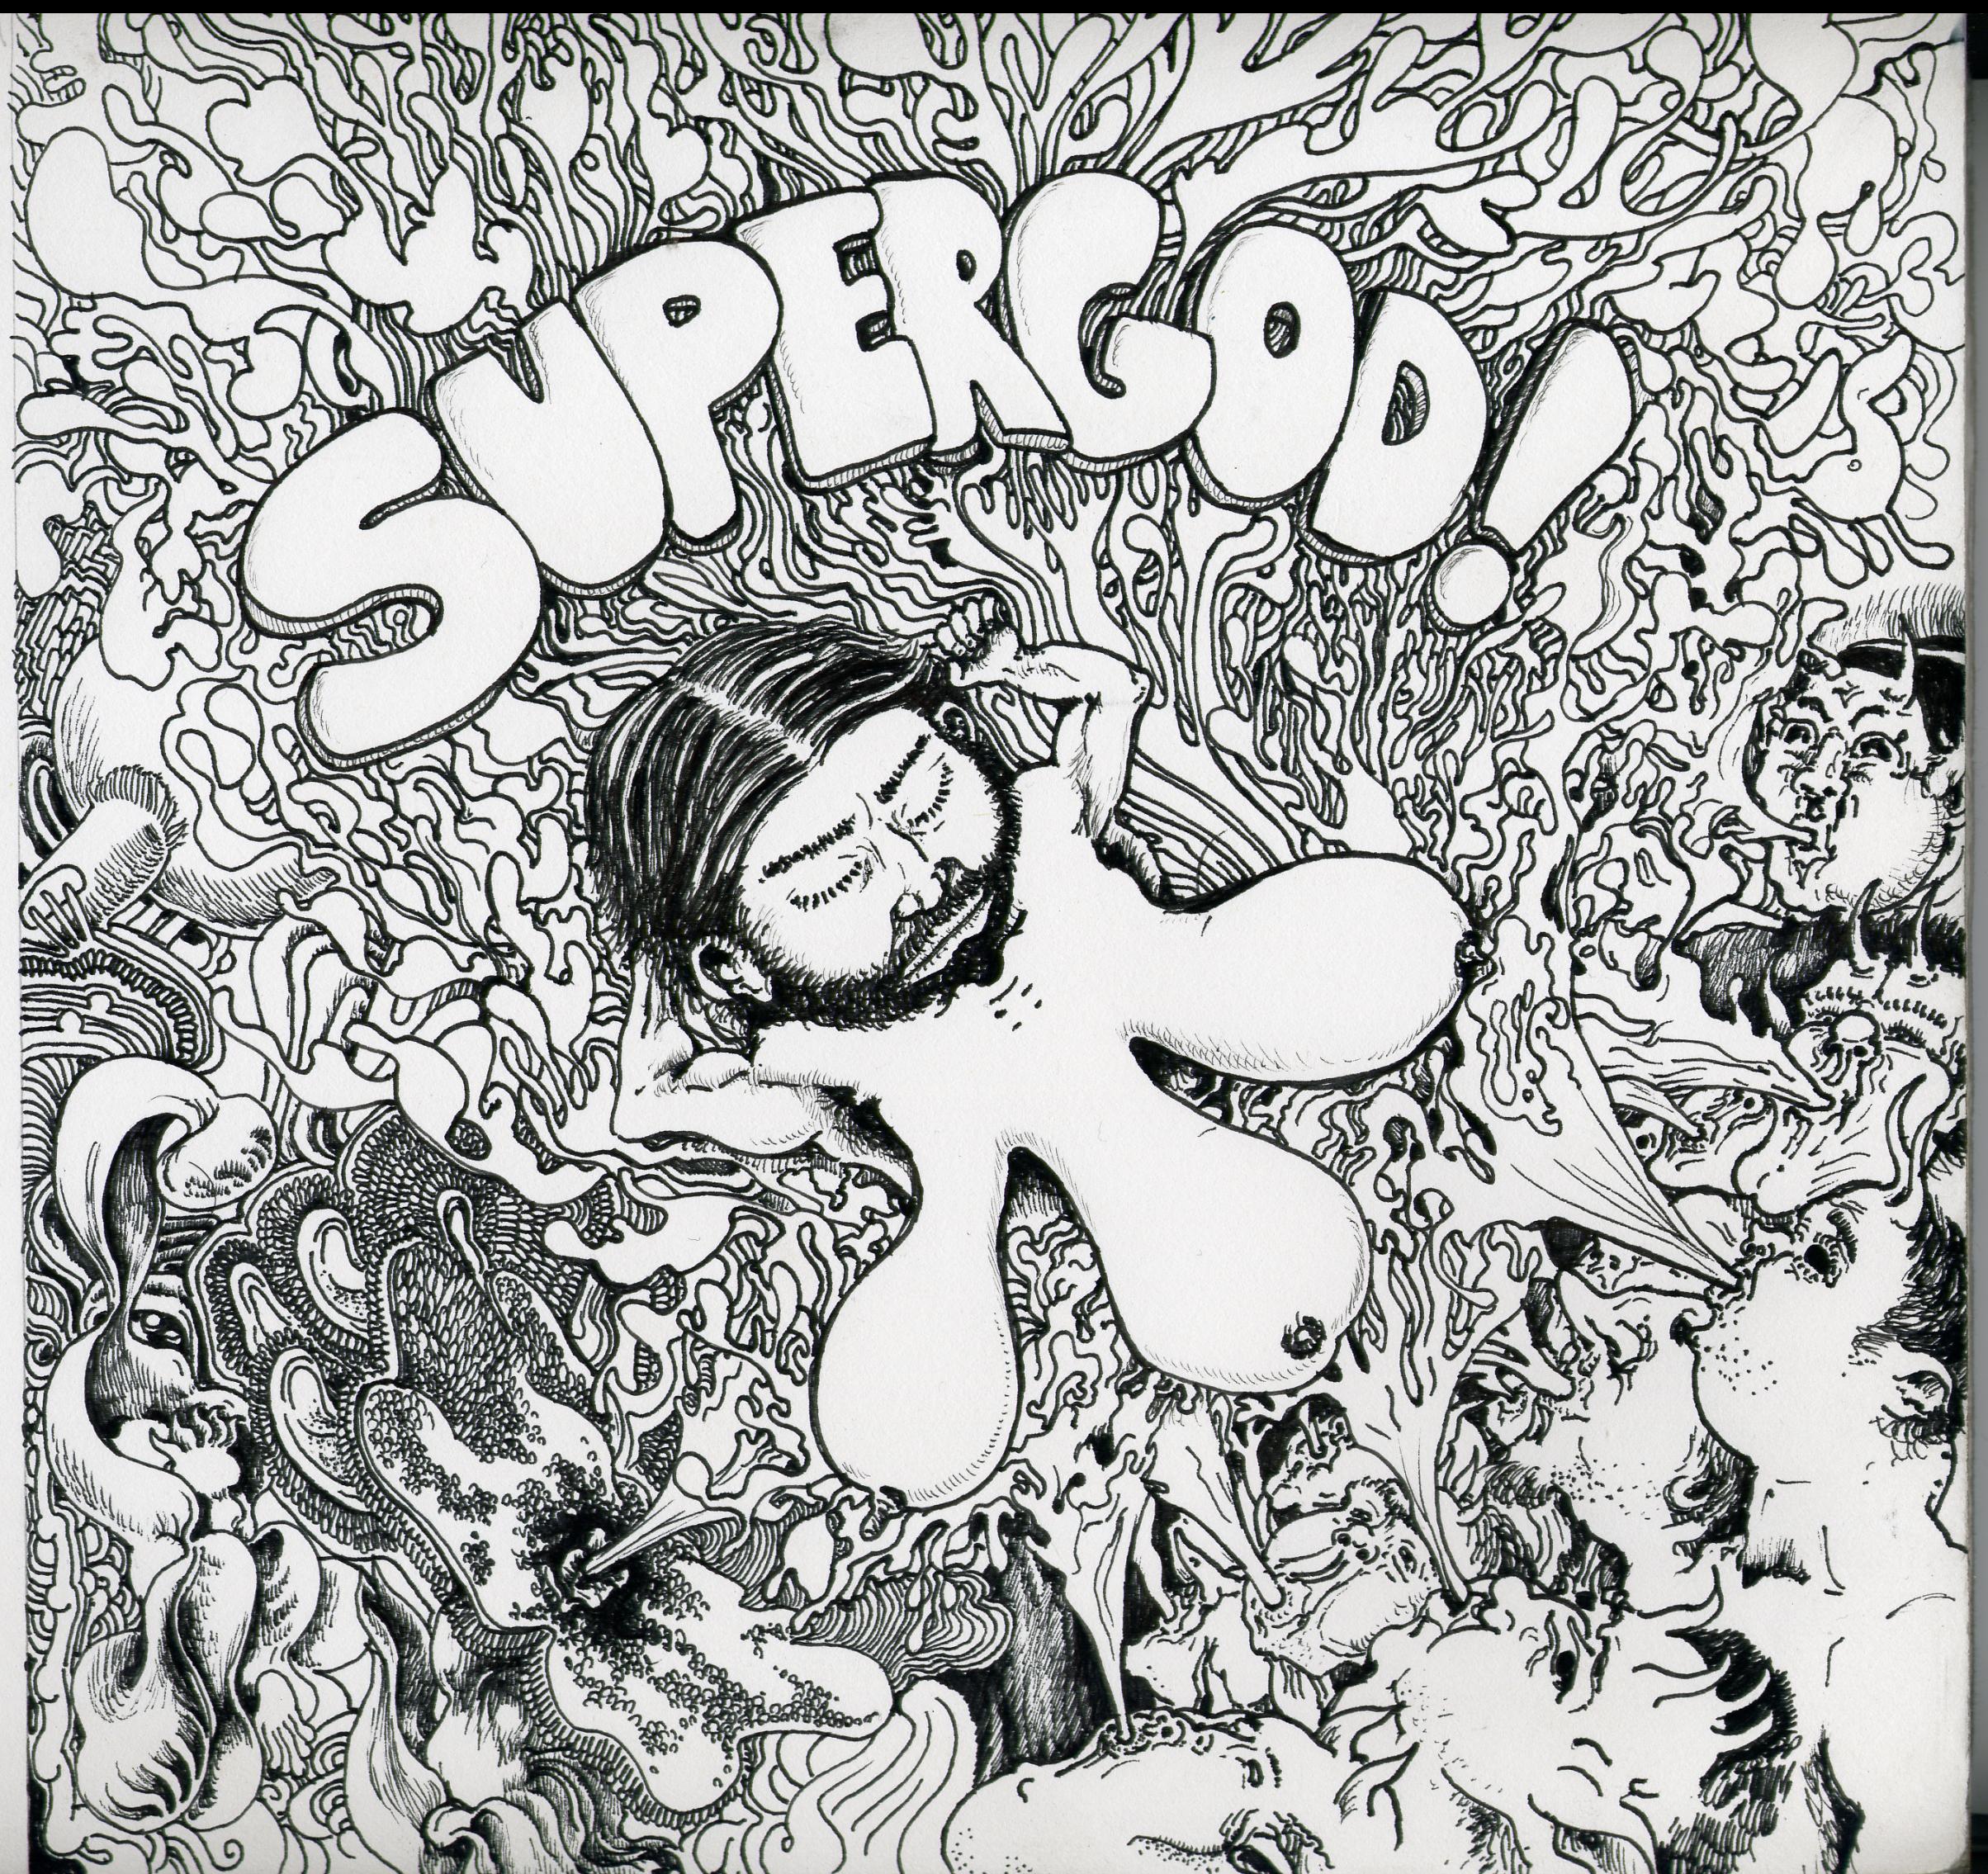 SUPERGOD! - SUPERGOD! - front cover